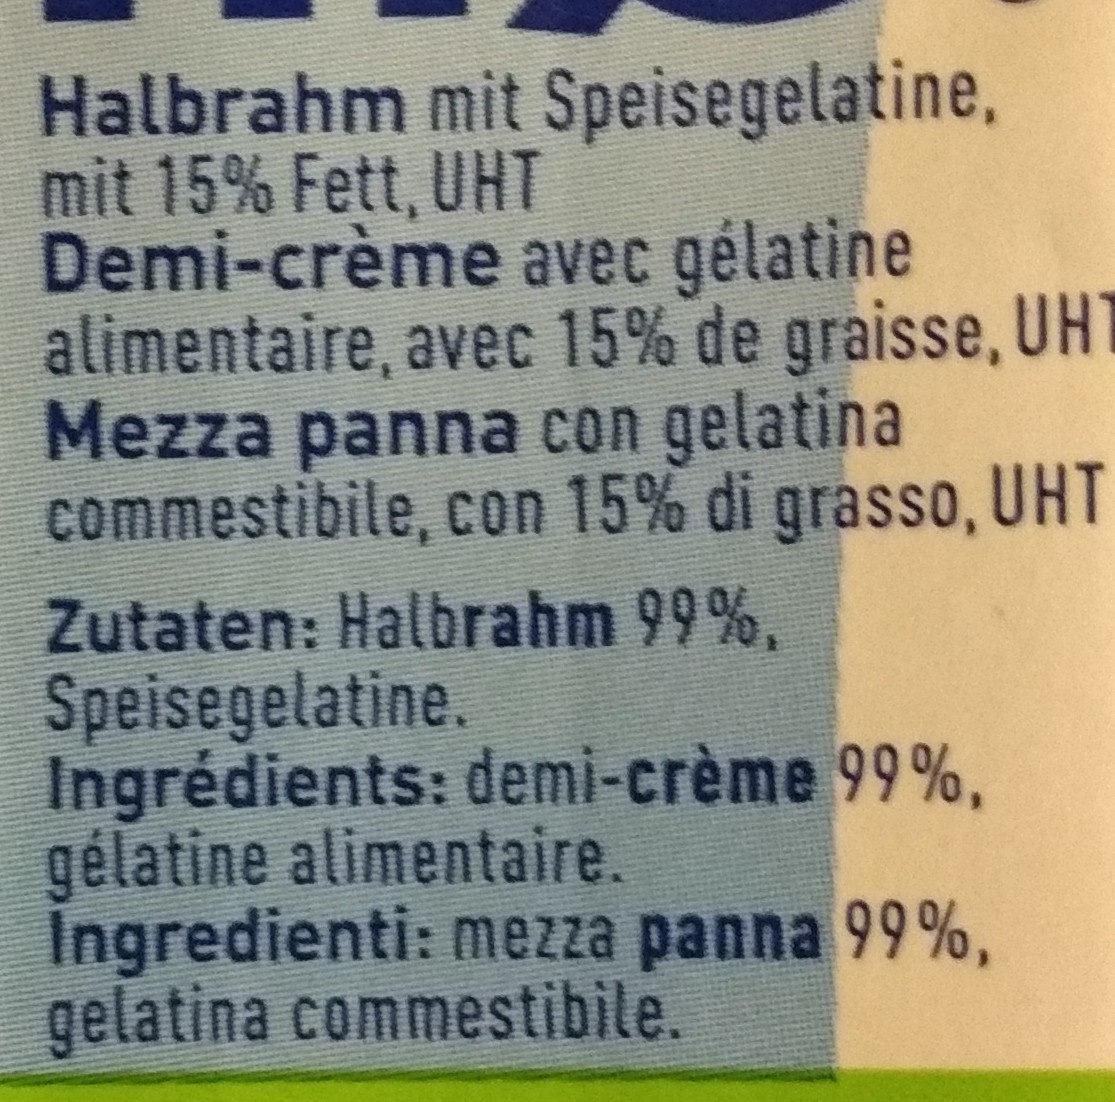 Qimiq Verdickter Halbrahm Uht - Ingredients - fr